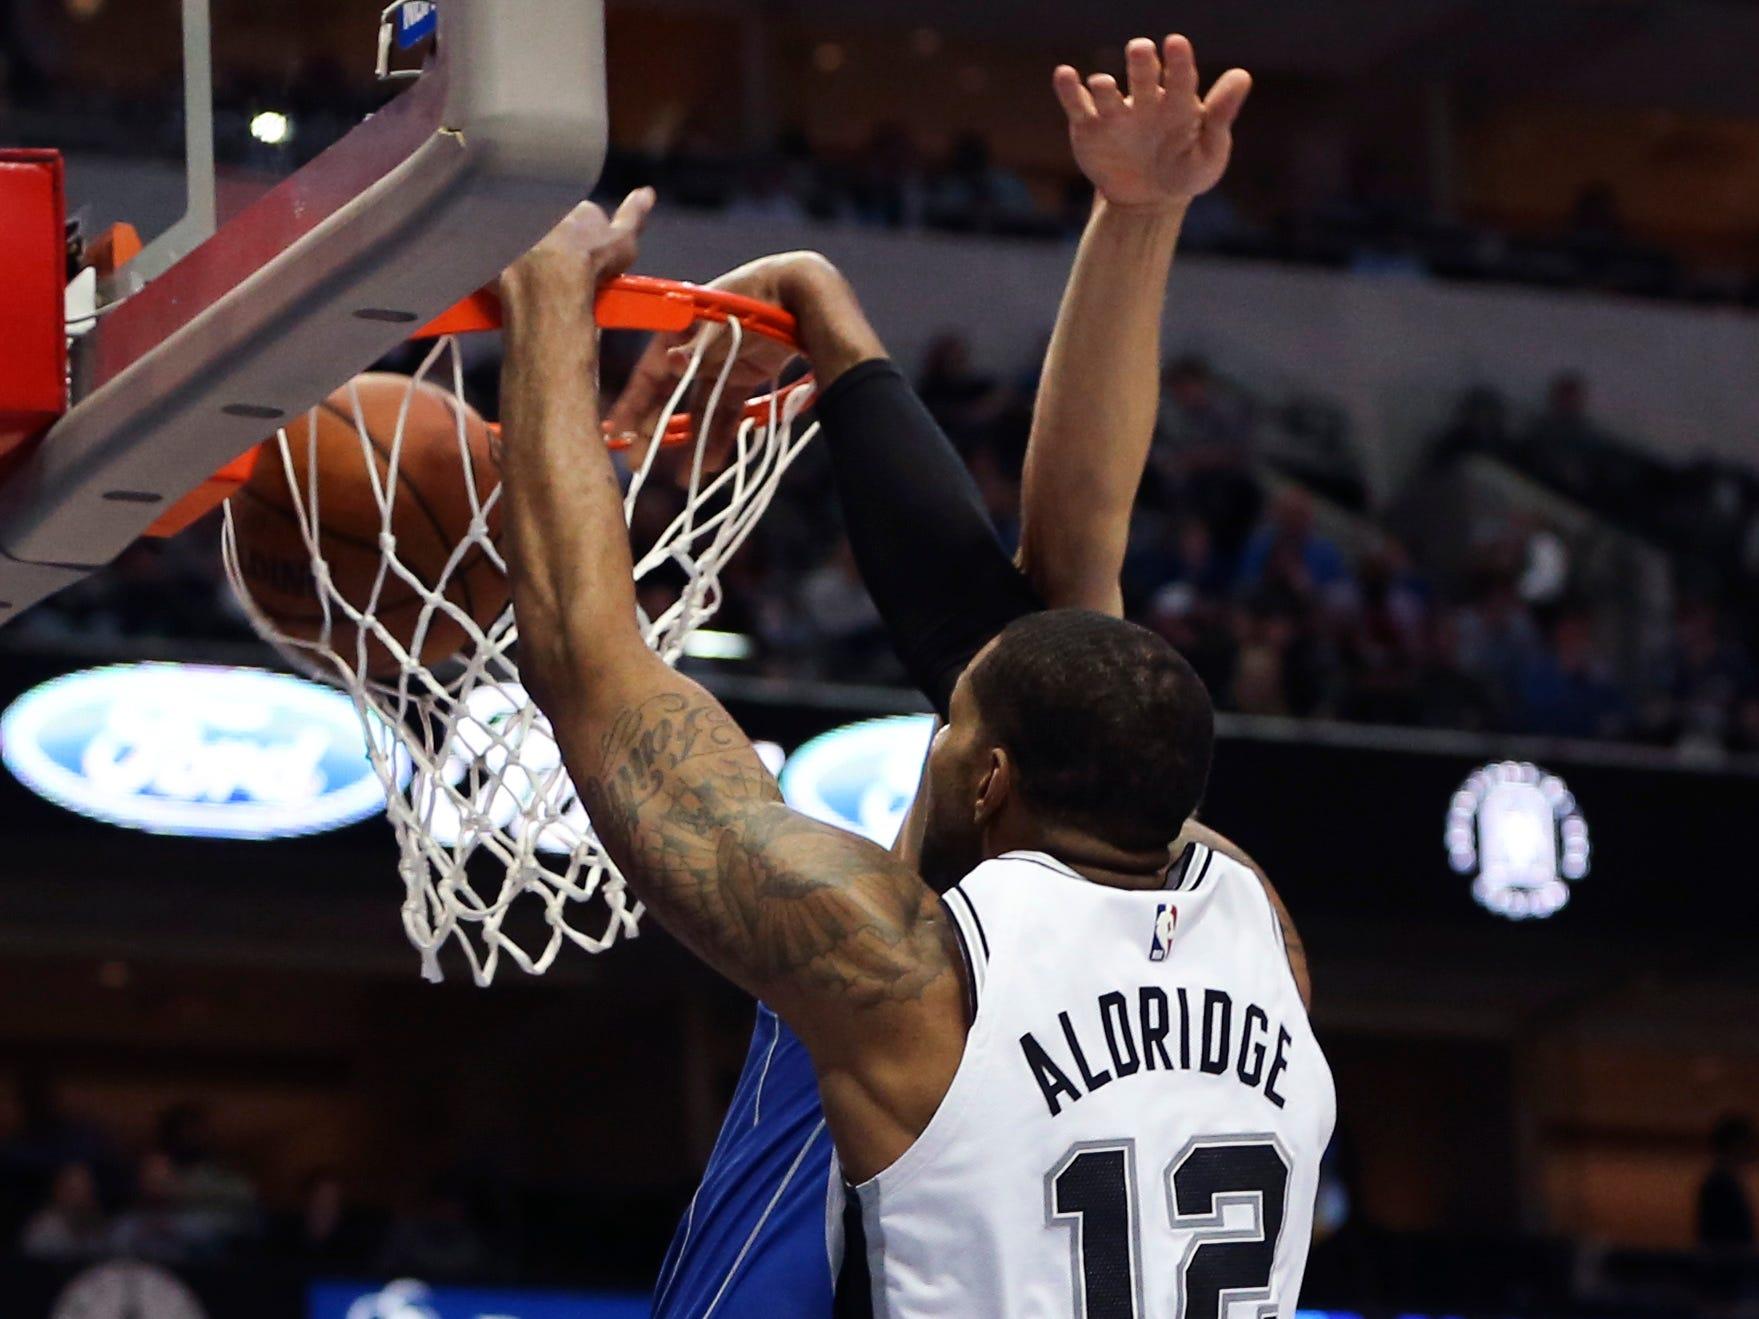 March 12: San Antonio Spurs center LaMarcus Aldridge dunks against the Dallas Mavericks at American Airlines Center.